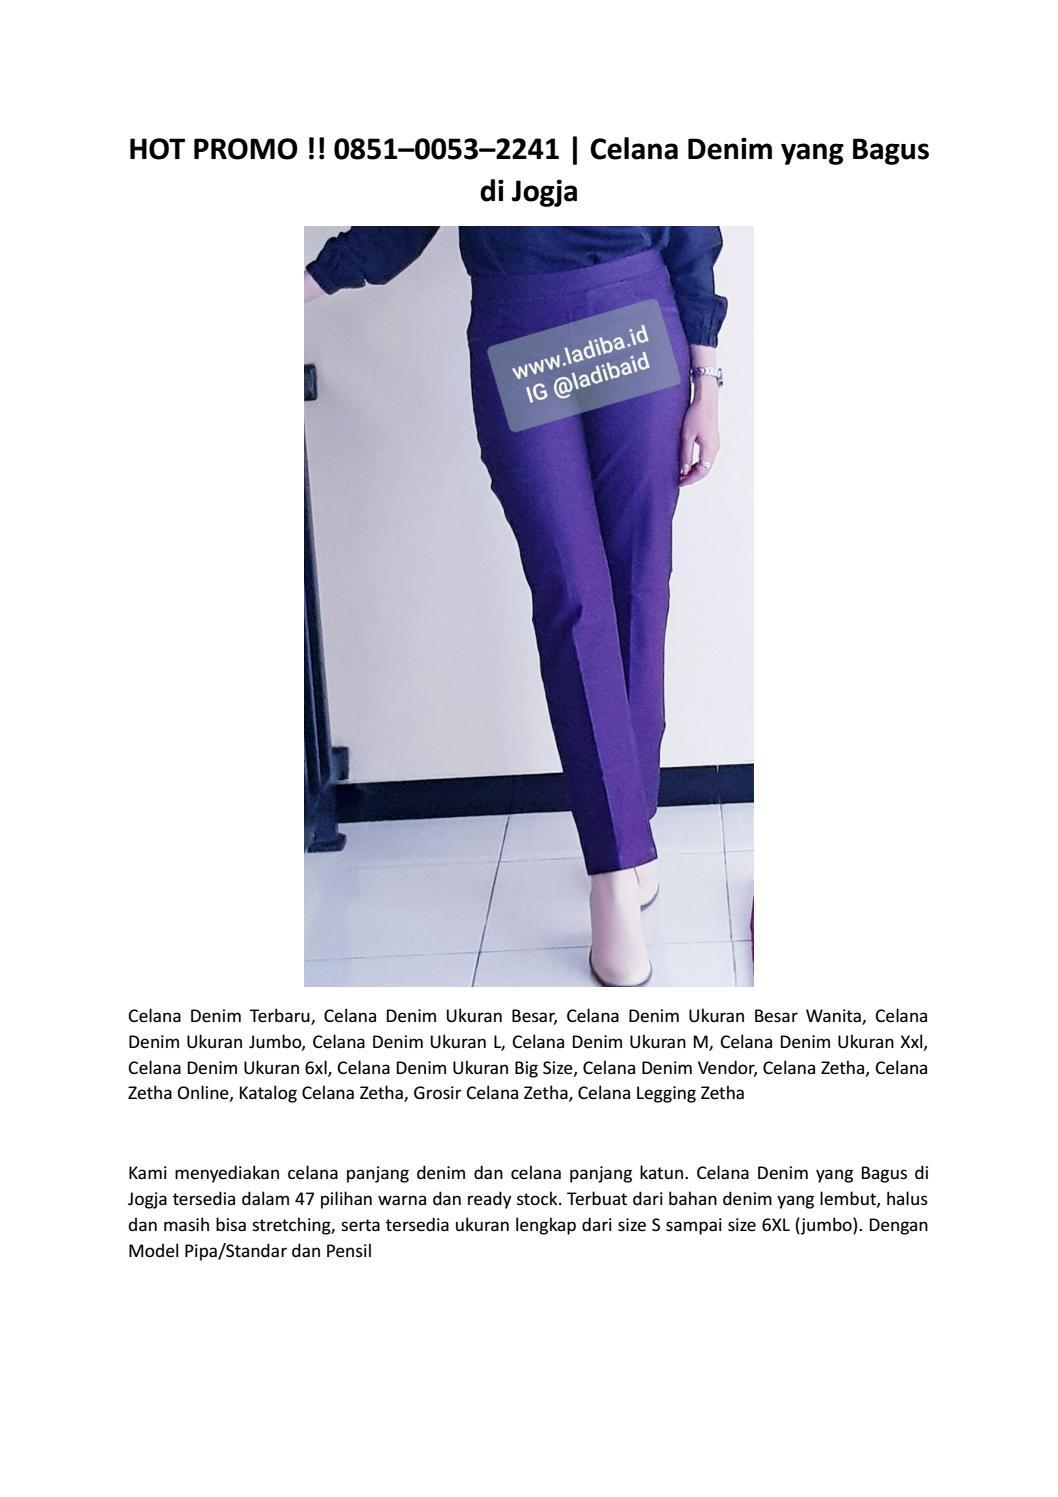 Hot Promo 0851 0053 2241 Celana Denim Yang Bagus Di Jogja By Celana Denim Wanita 0851 0053 2241 Issuu